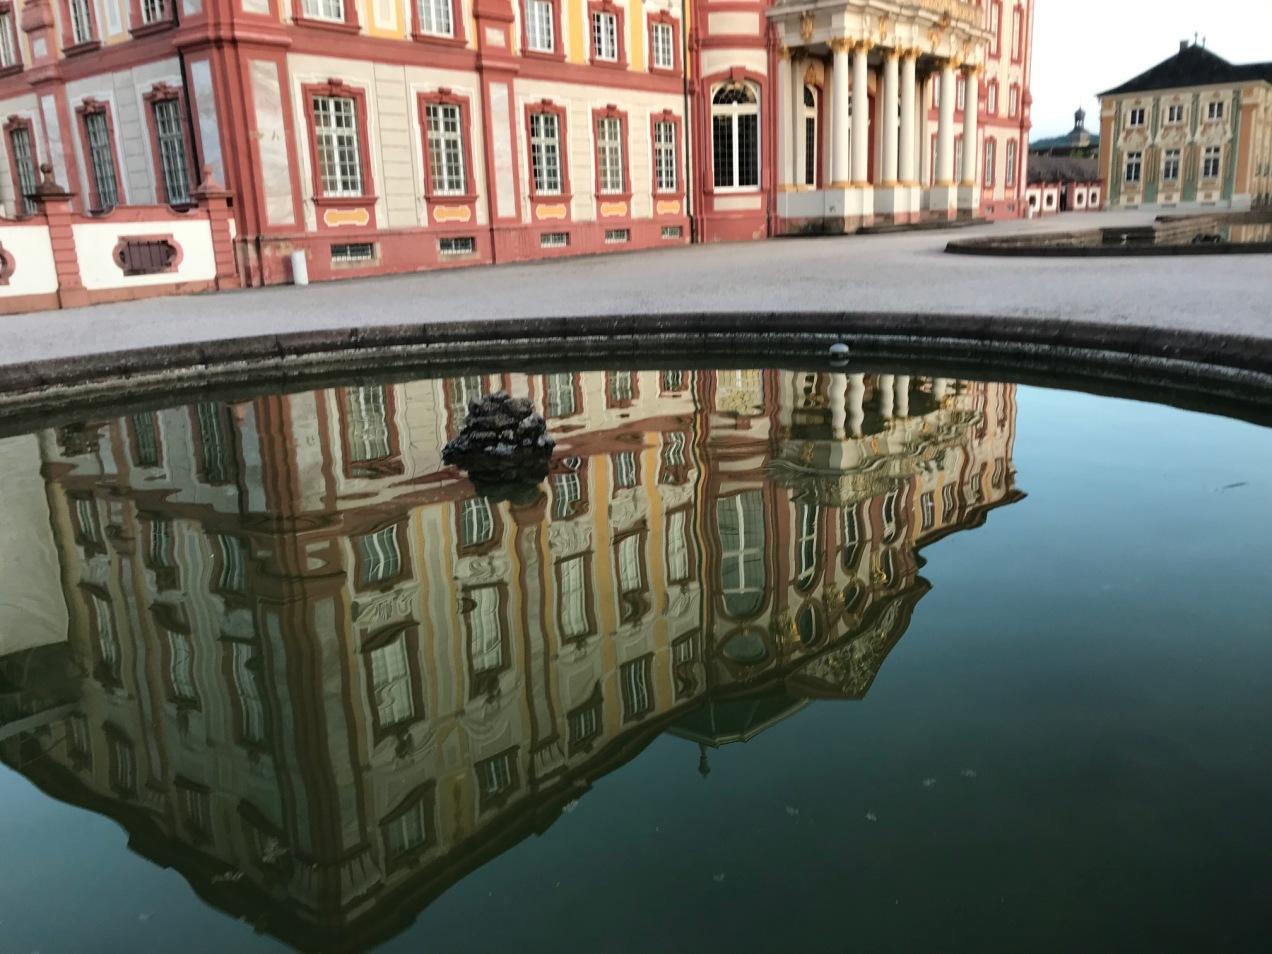 Schloss Bruchsal im Spiegel